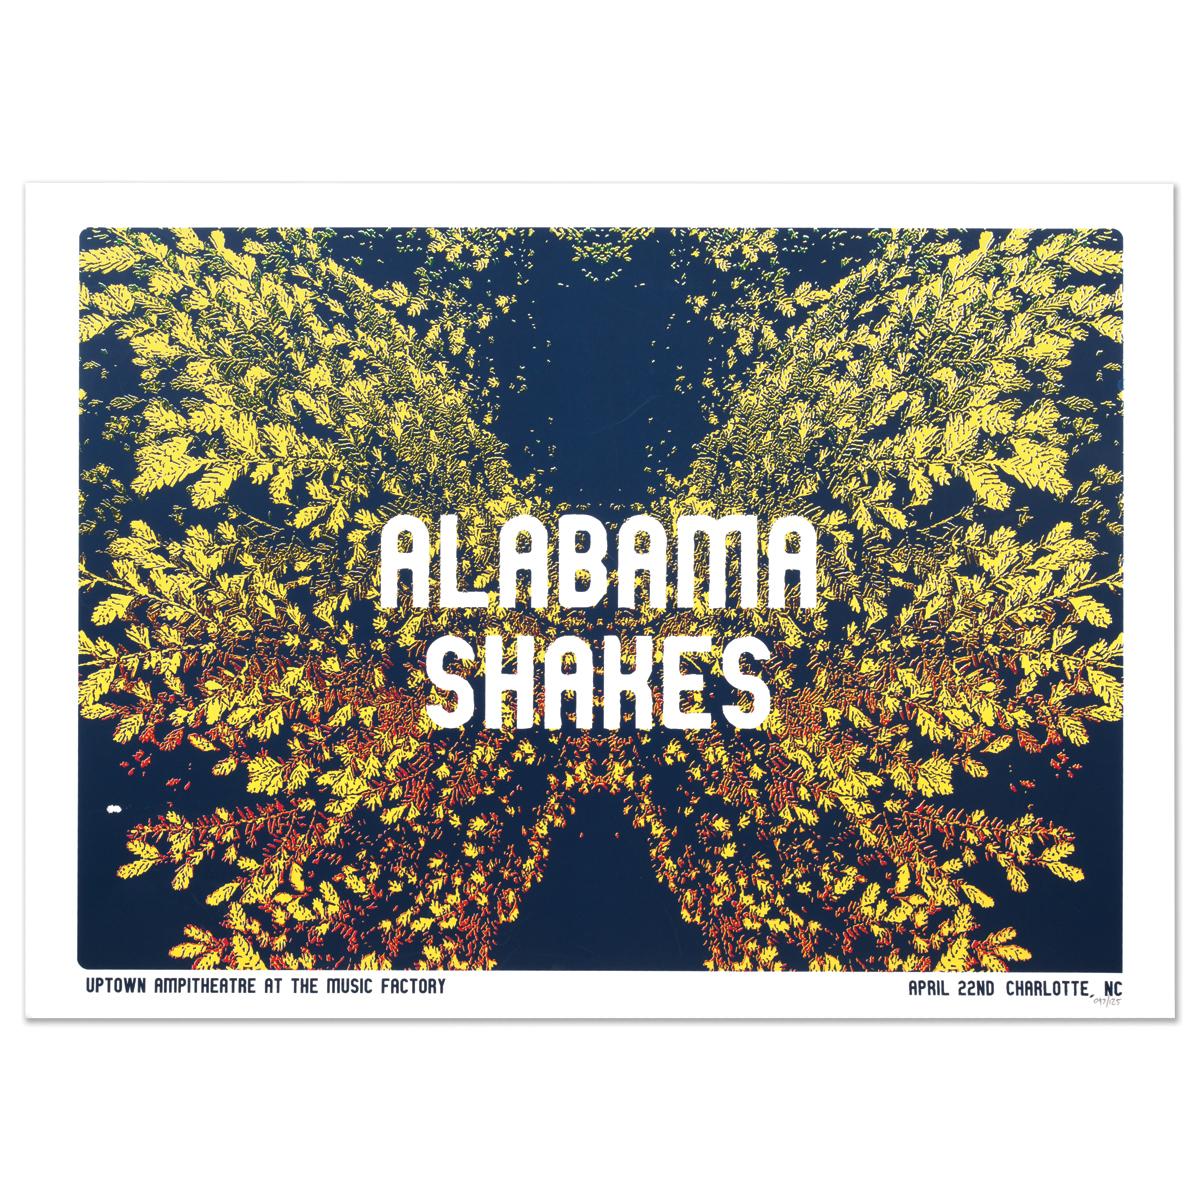 Alabama Shakes Show Poster - Charlotte, NC 4/22/2016 | Musictoday ...